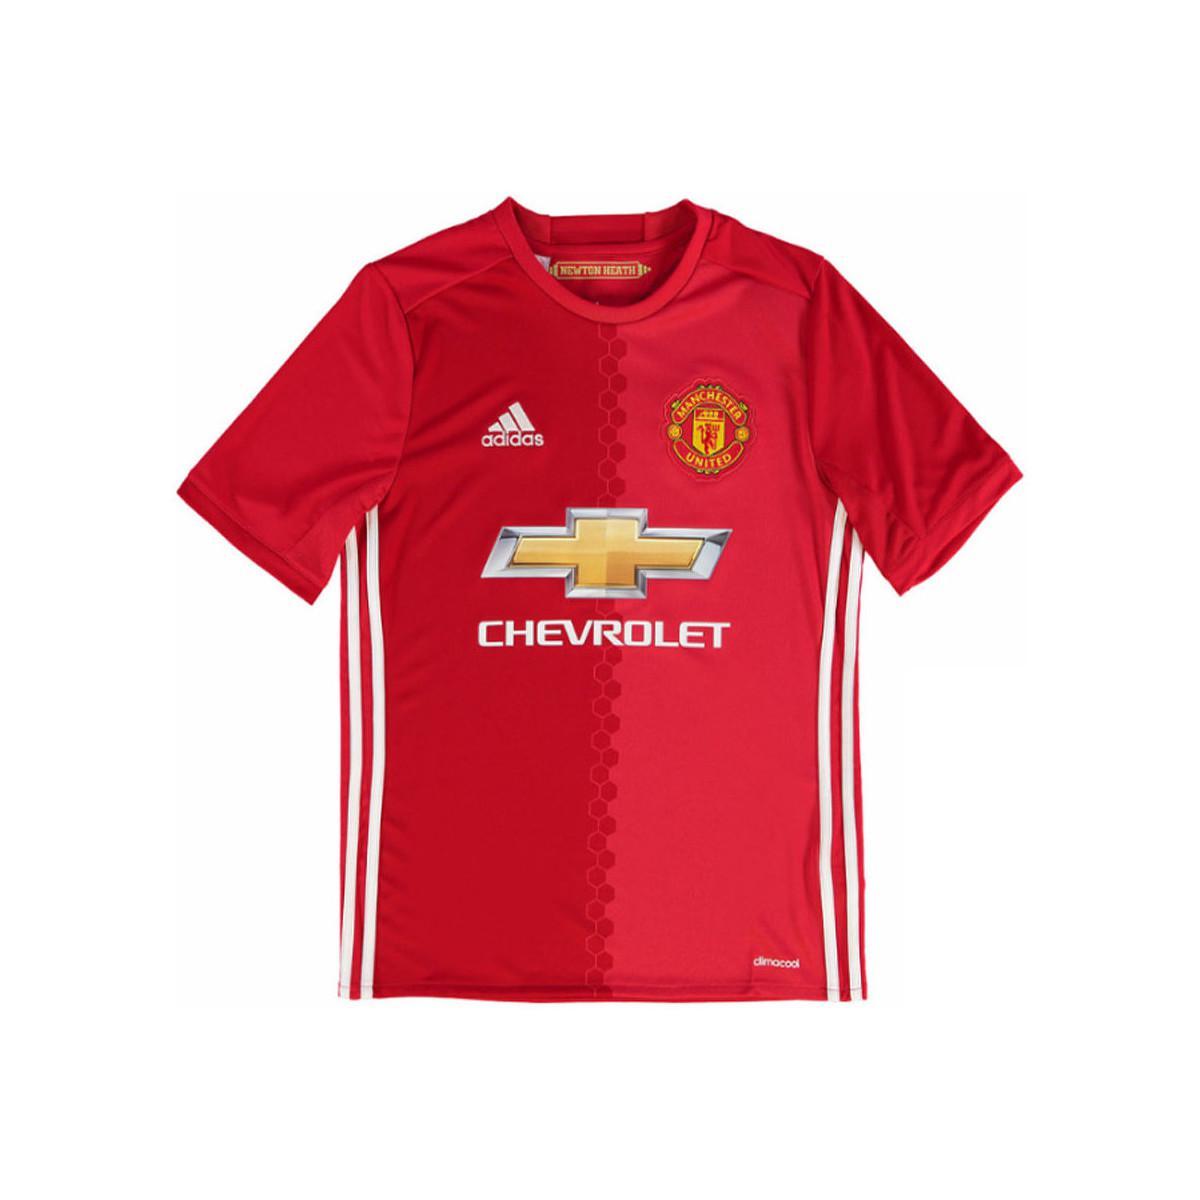 4910e959e56 Adidas - 2016-17 Manchester United Home Shirt (pogba 6) - Kids Women s.  View fullscreen